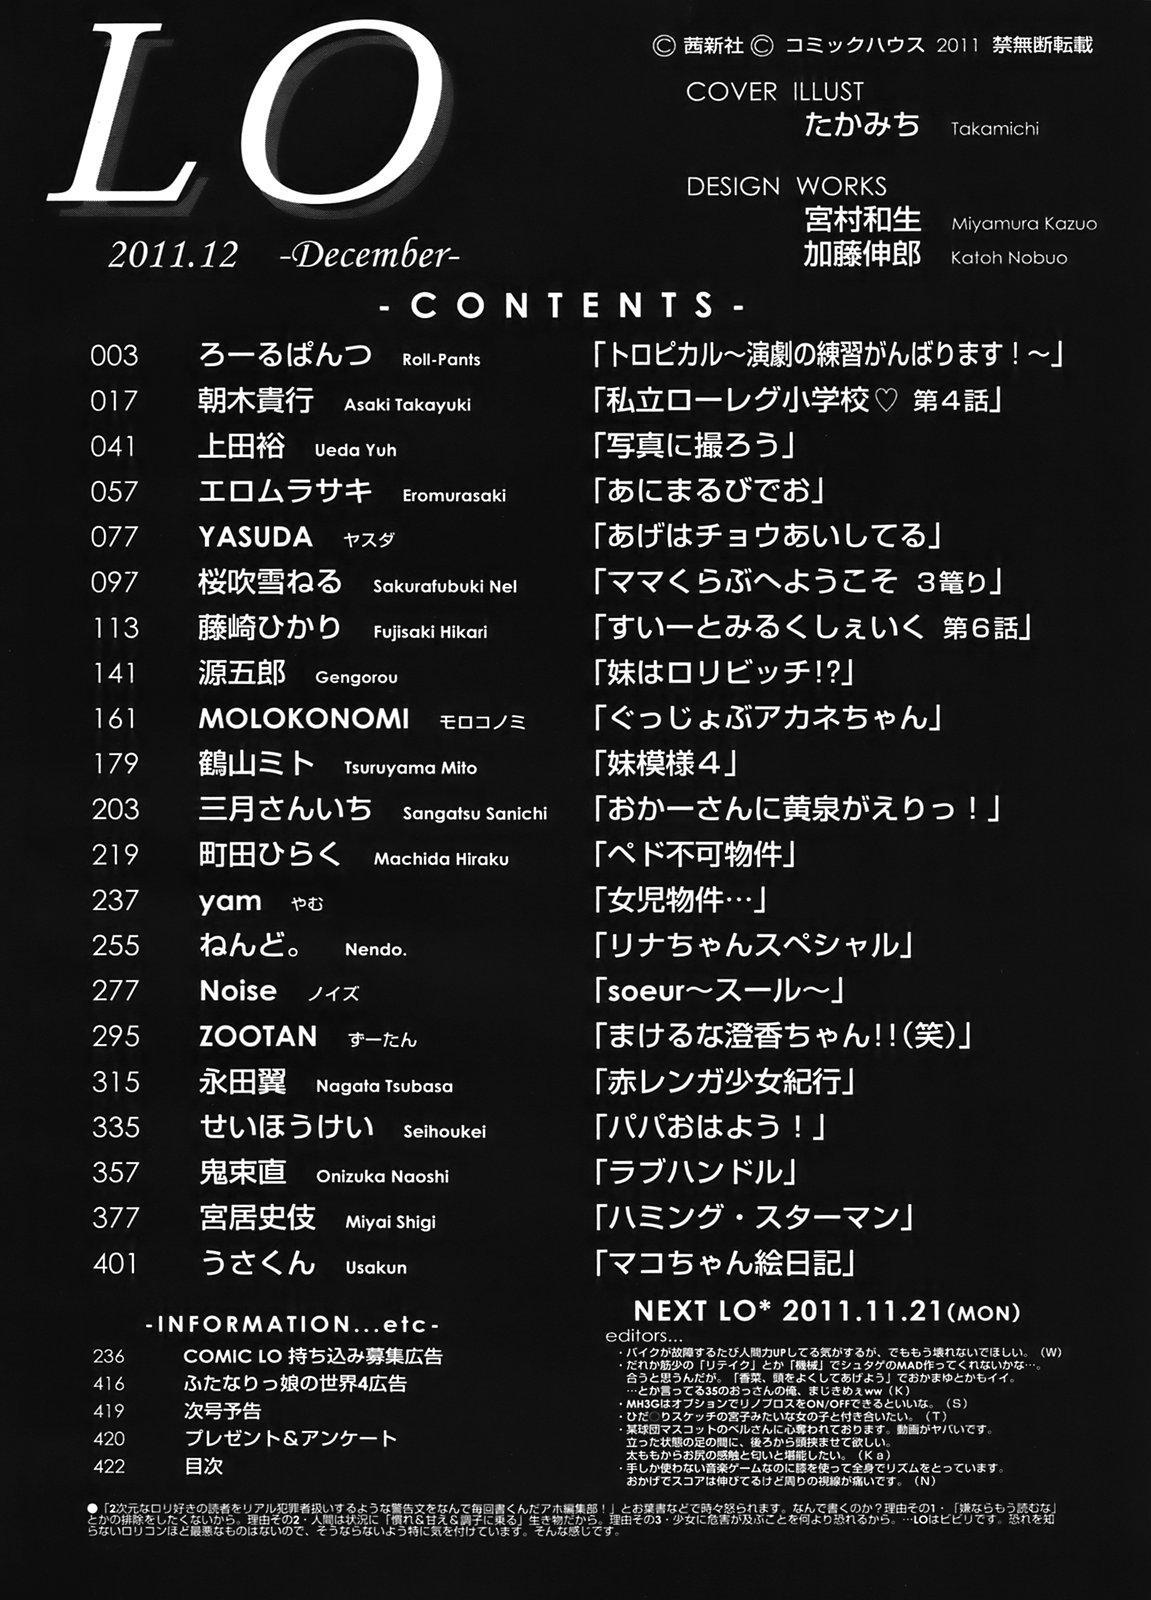 COMIC LO 2011-12 Vol. 93 422